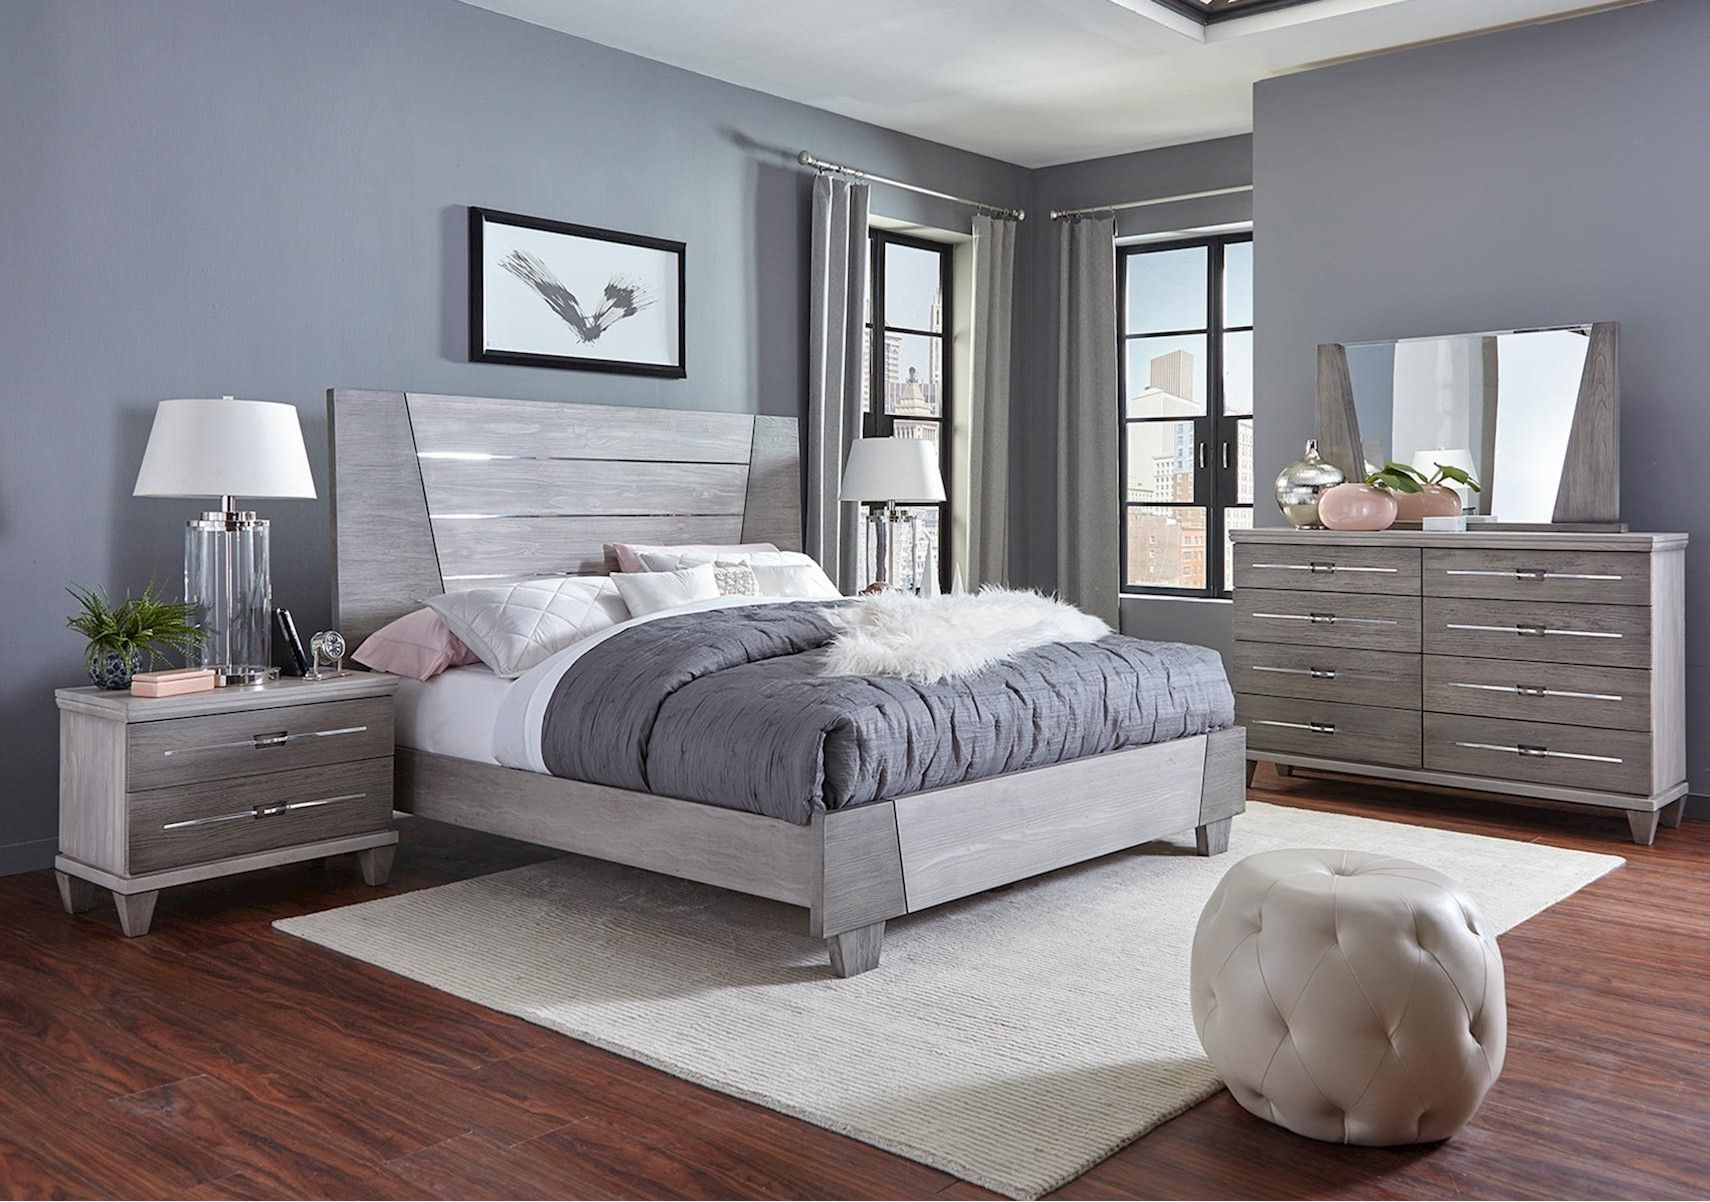 Lacks Matrix 4 Pc Queen Bedroom Set Grey Bedroom With Pop Of Color Bedroom Decor Inspiration Bedroom Sets